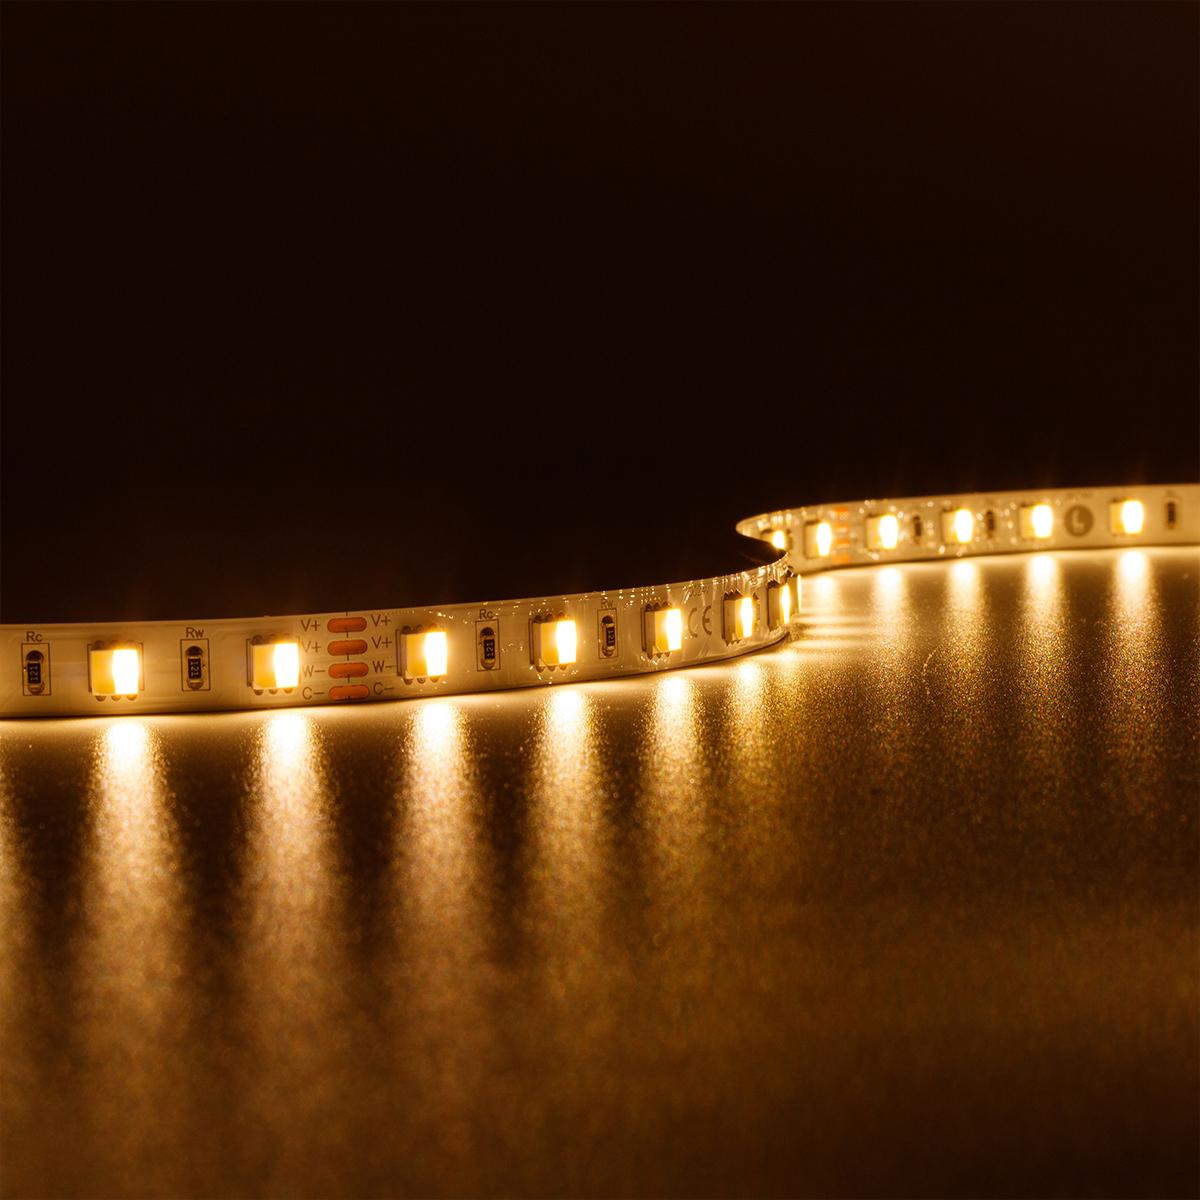 Strip CCT Dual Weiß 24V LED Streifen 5M 14,4W/m 60LED/m 10mm IP20 Lichtfarbe einstellbar 2700-6500K